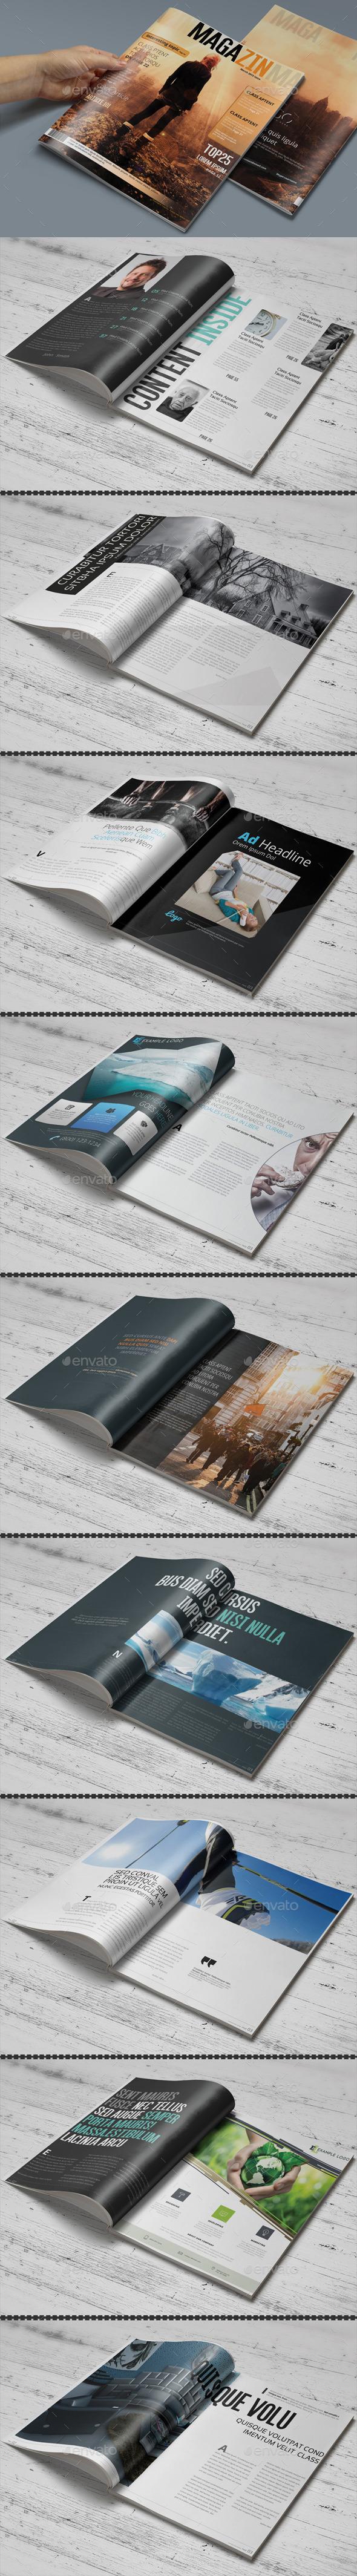 Photoshop Magazine Template - Magazines Print Templates